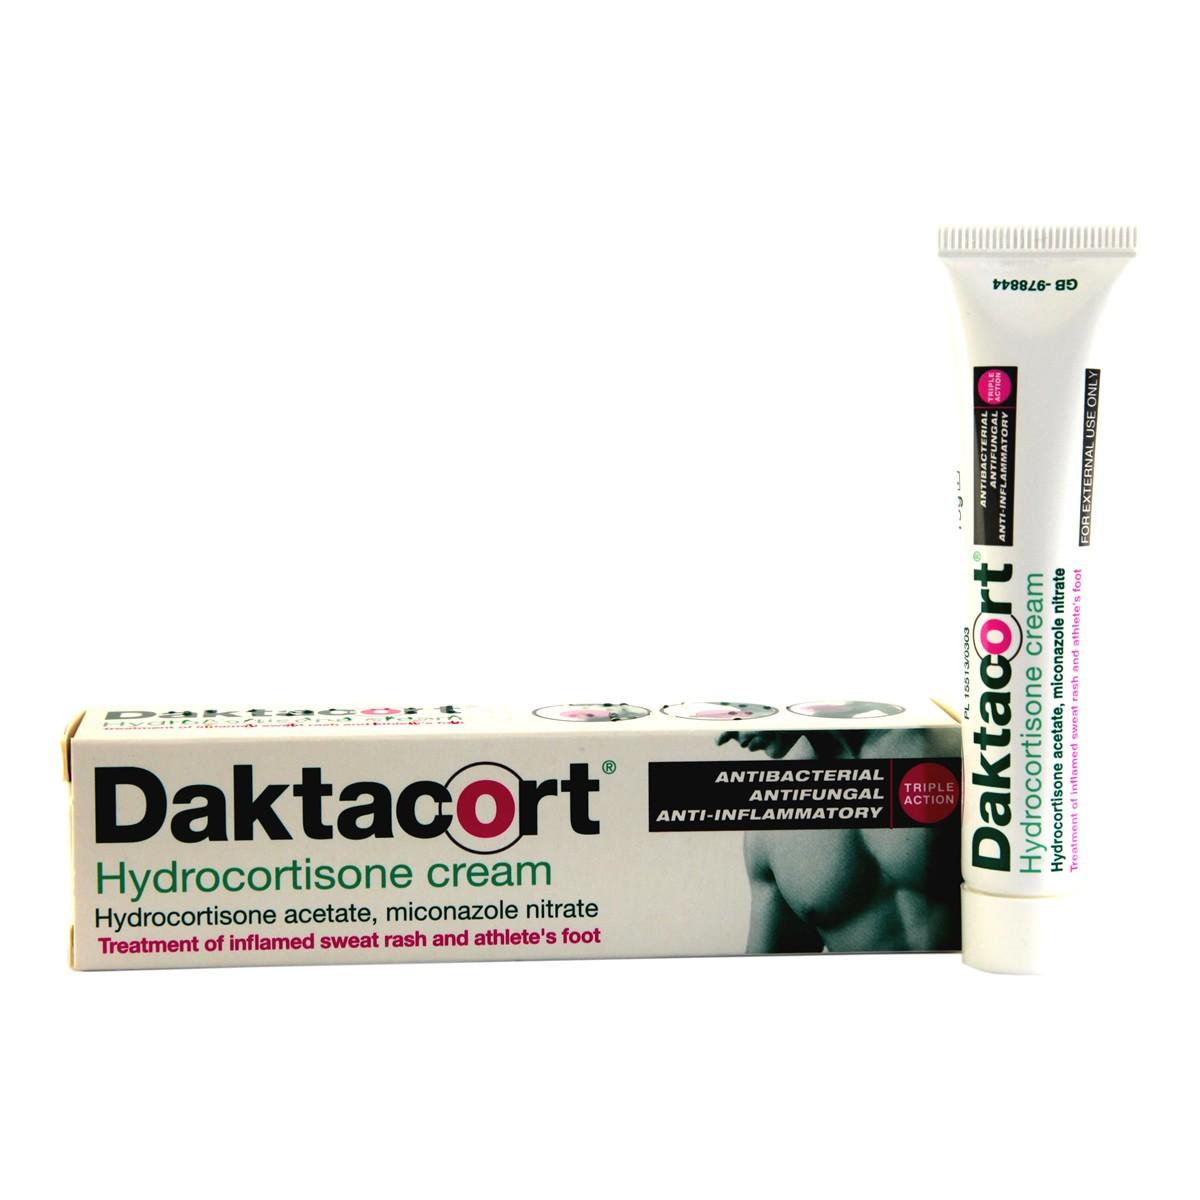 Daktacort Hydrocortisone Cream